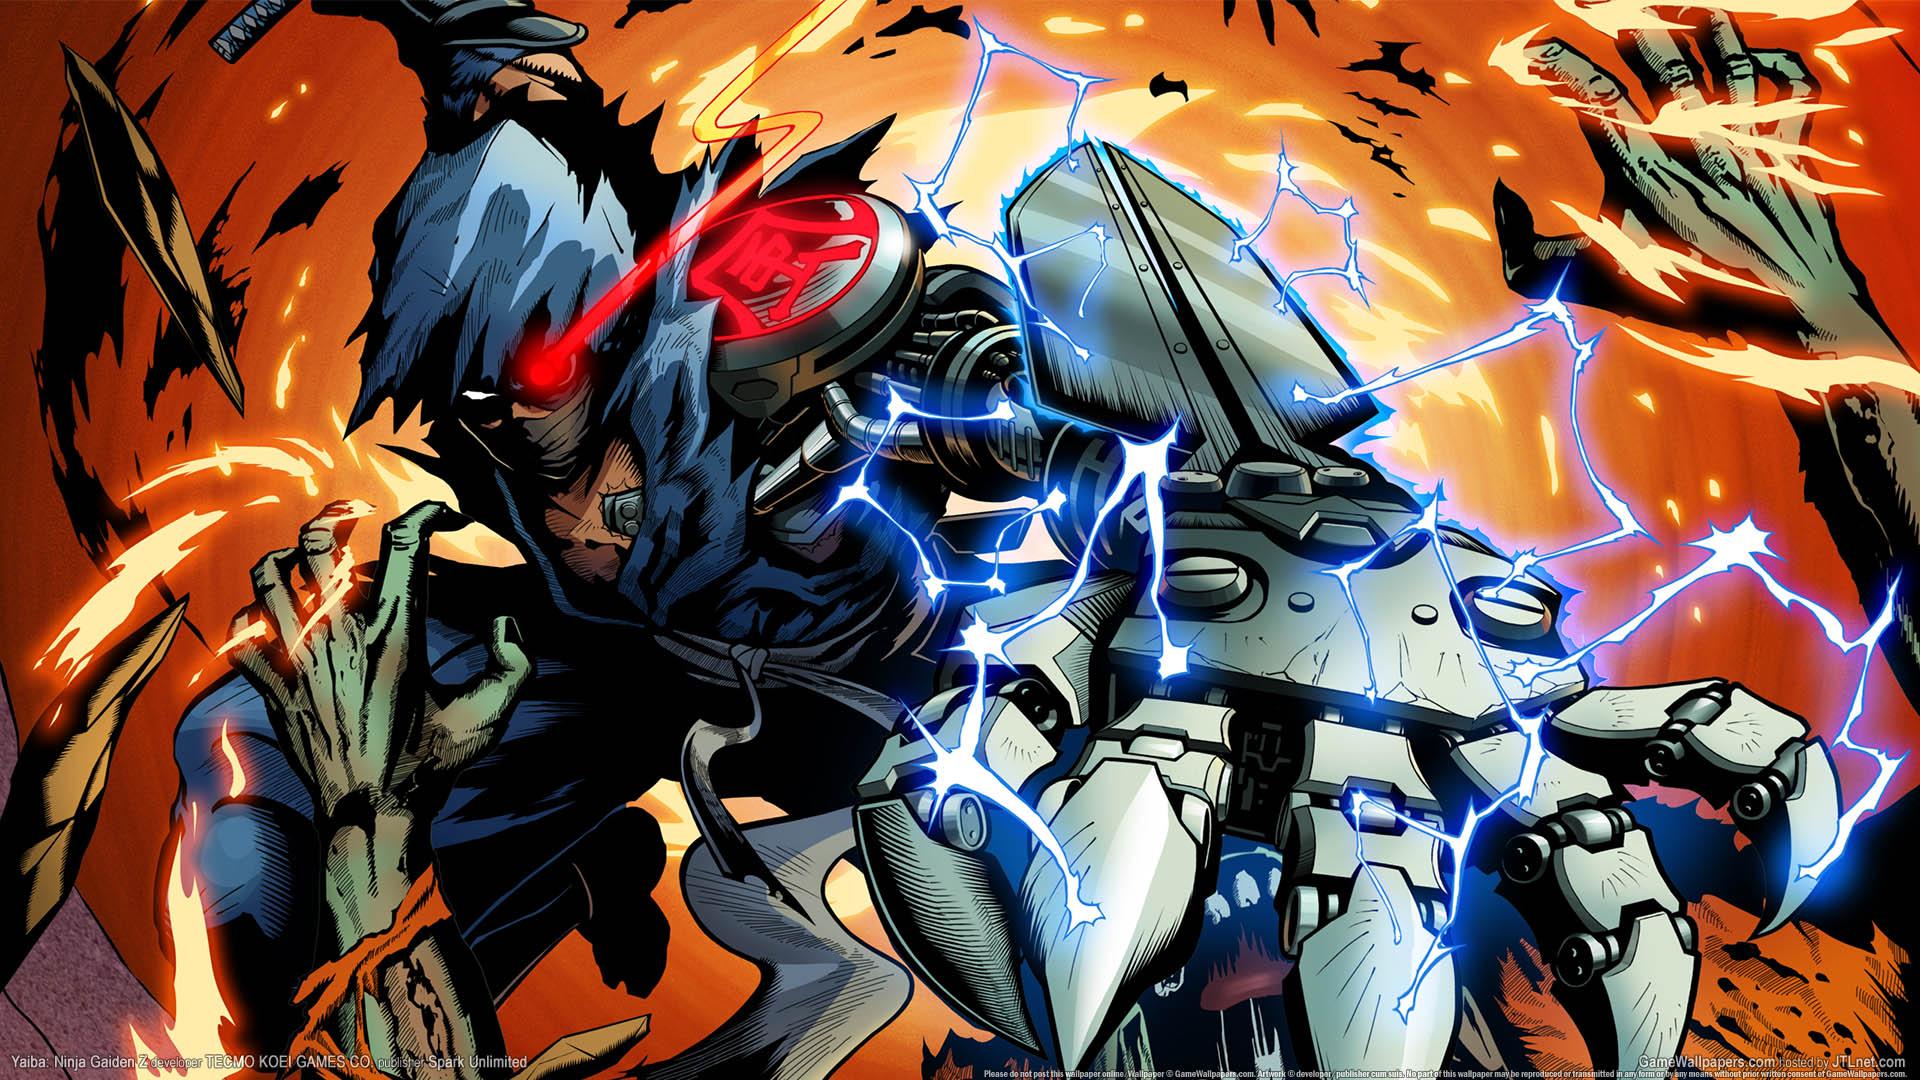 Yaiba: Ninja Gaiden Z Hintergrundbild 03 1920x1080